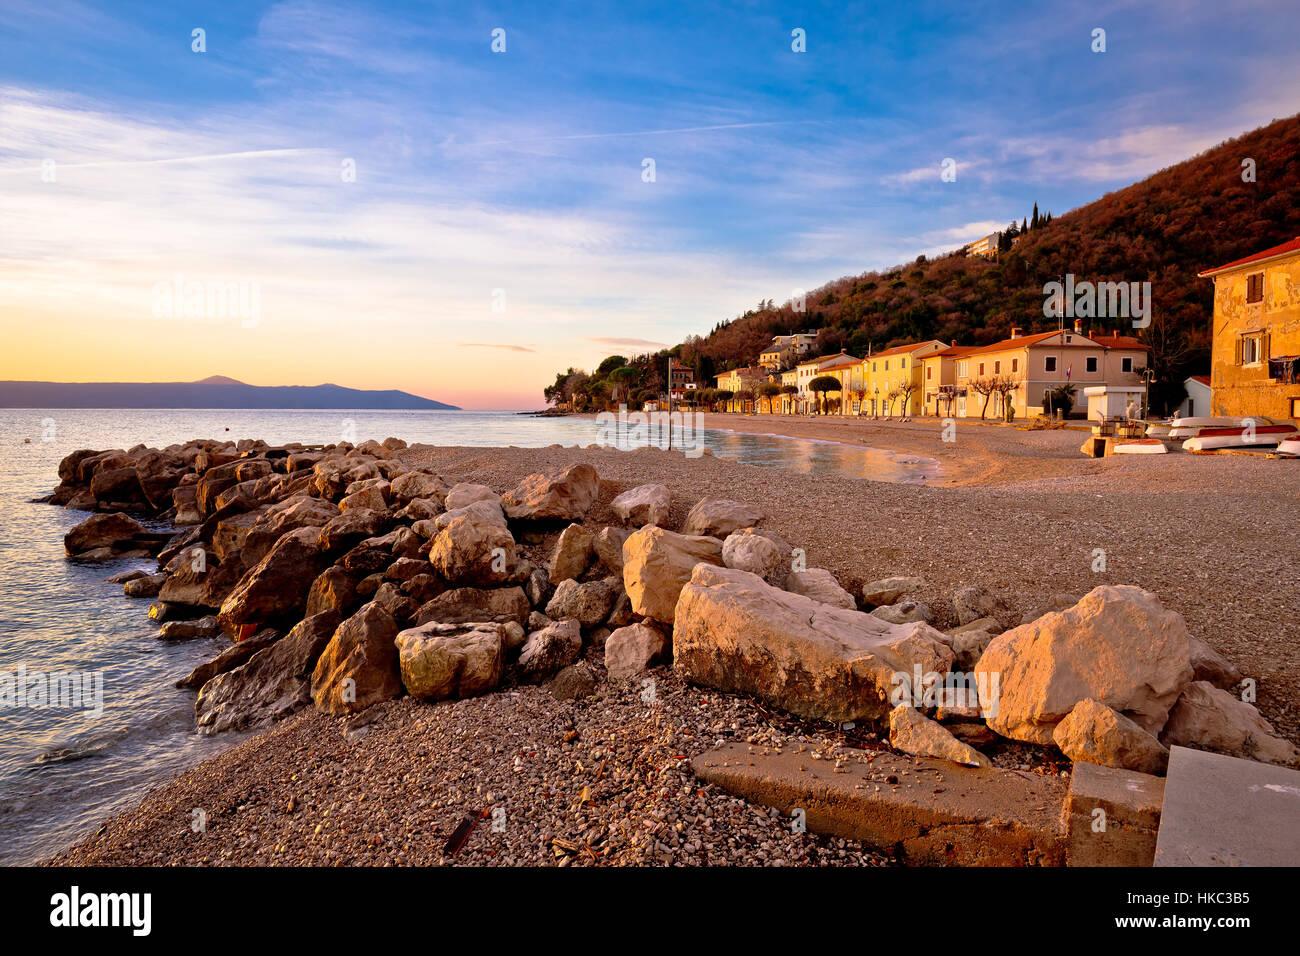 Moscenicka Draga village plage au lever du soleil, de la riviera d'Opatija Croatie Photo Stock